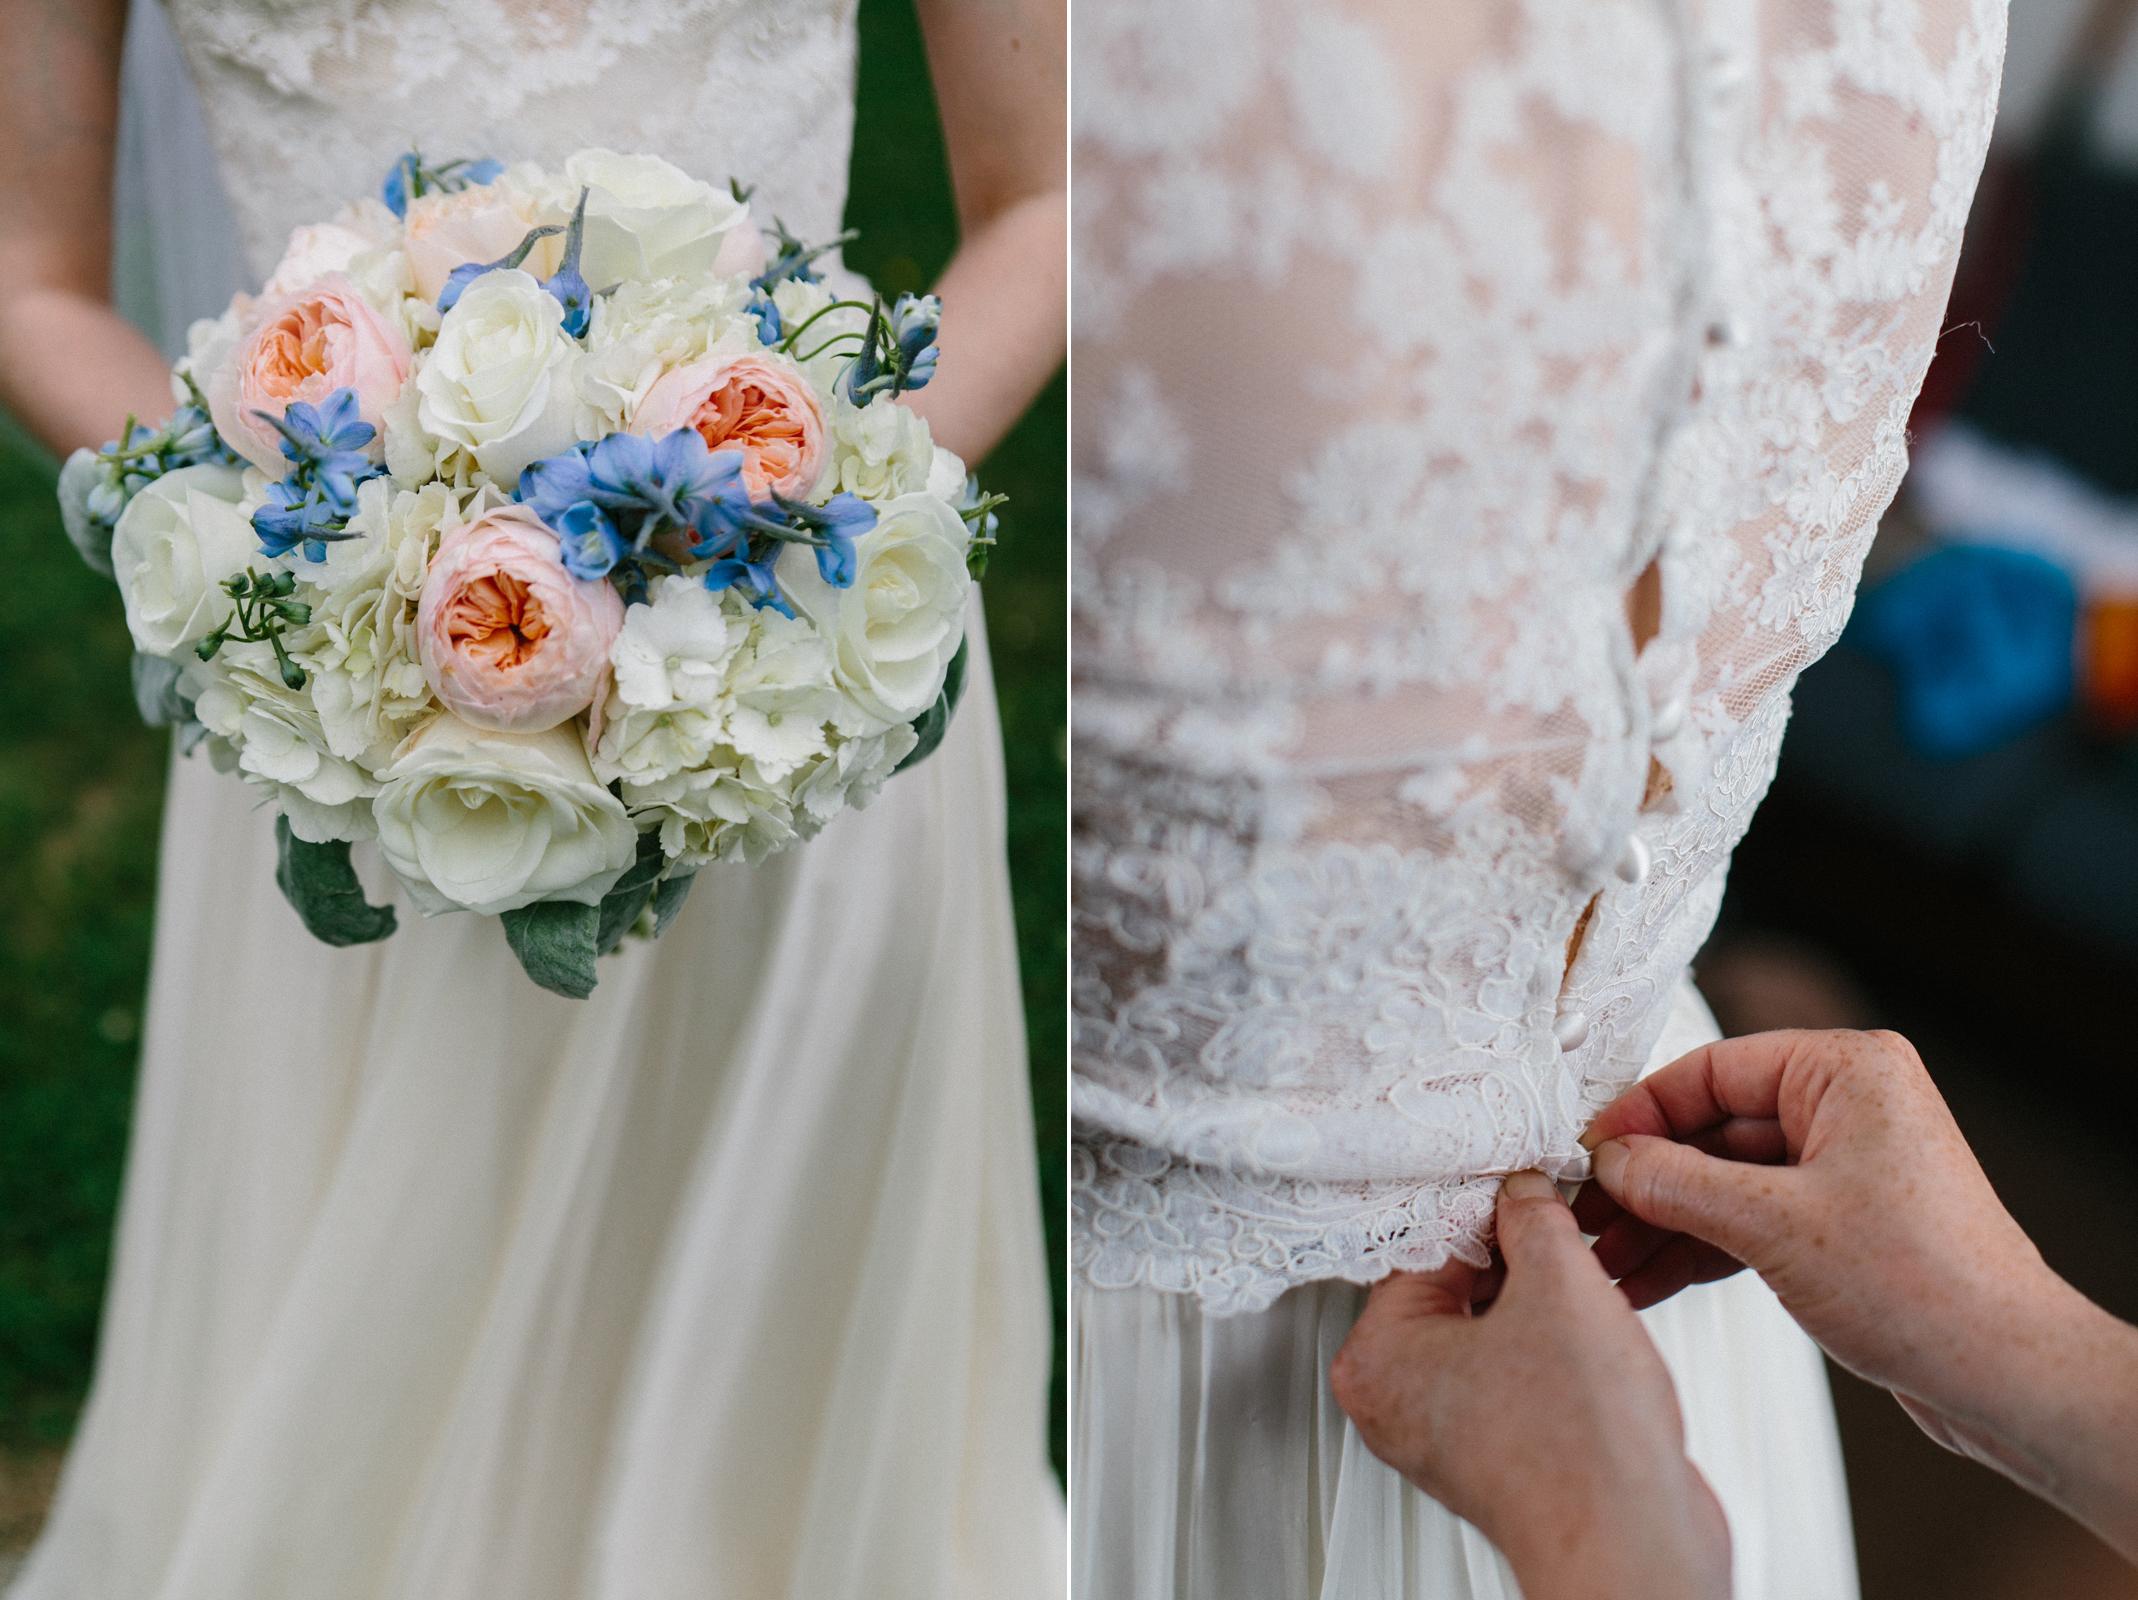 wedding bouquet and dress